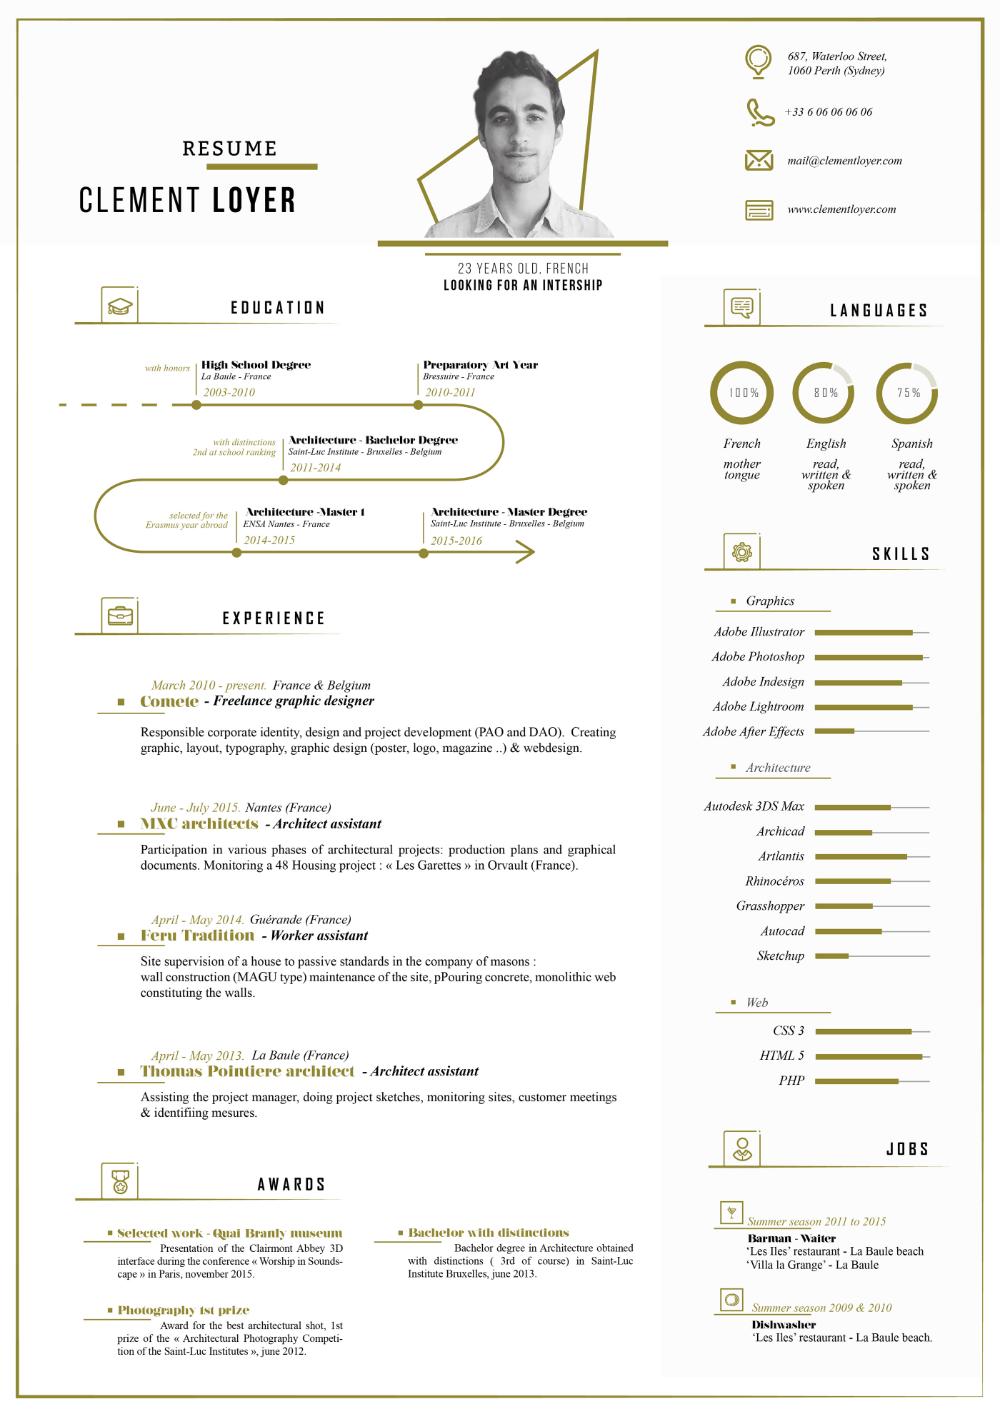 2016 Personal Resume on Behance en 2020 Cv créatif